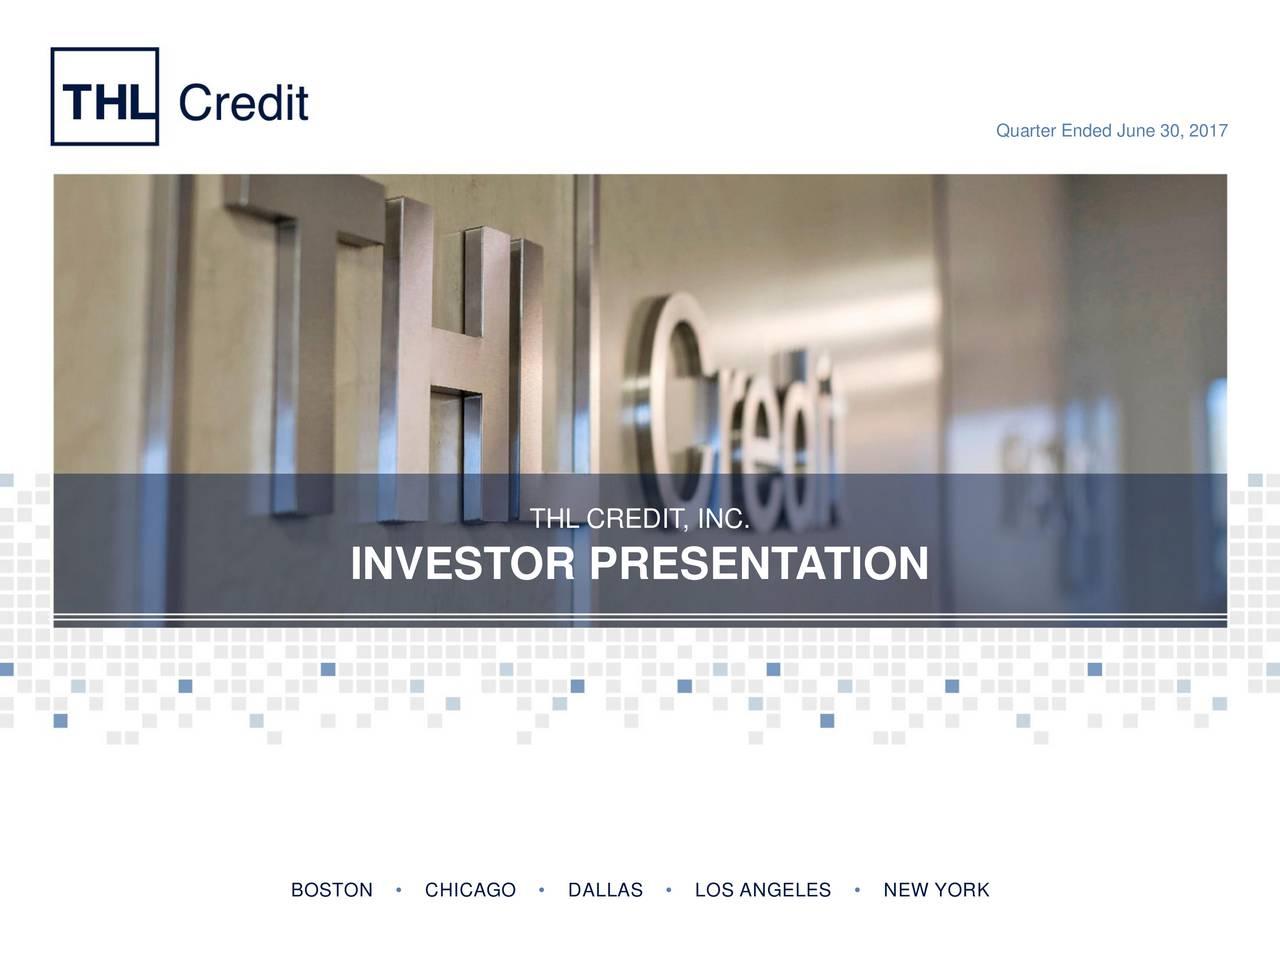 THL CREDIT, INC. INVESTOR PRESENTATION BOSTON  CHICAGO  DALLAS  LOS ANGELES  NEW YORK